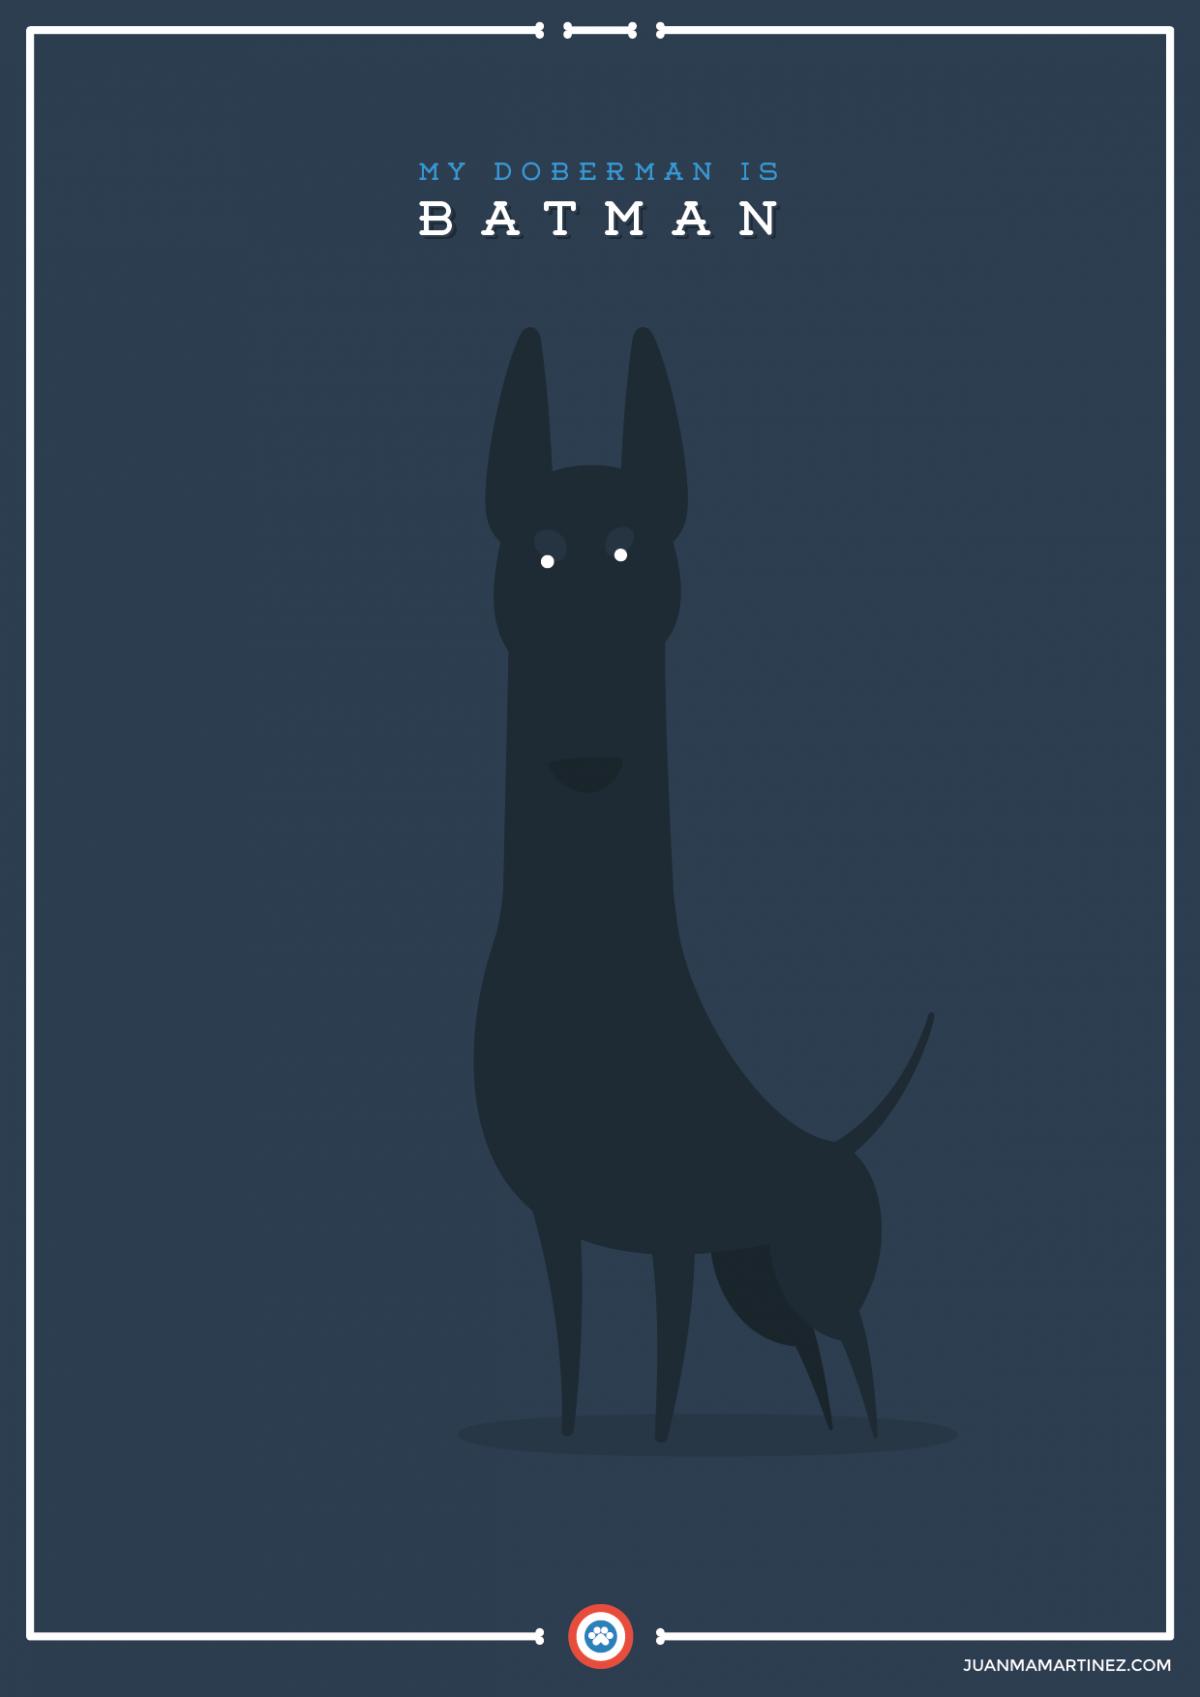 extraordinary-doggies-illustration-batman